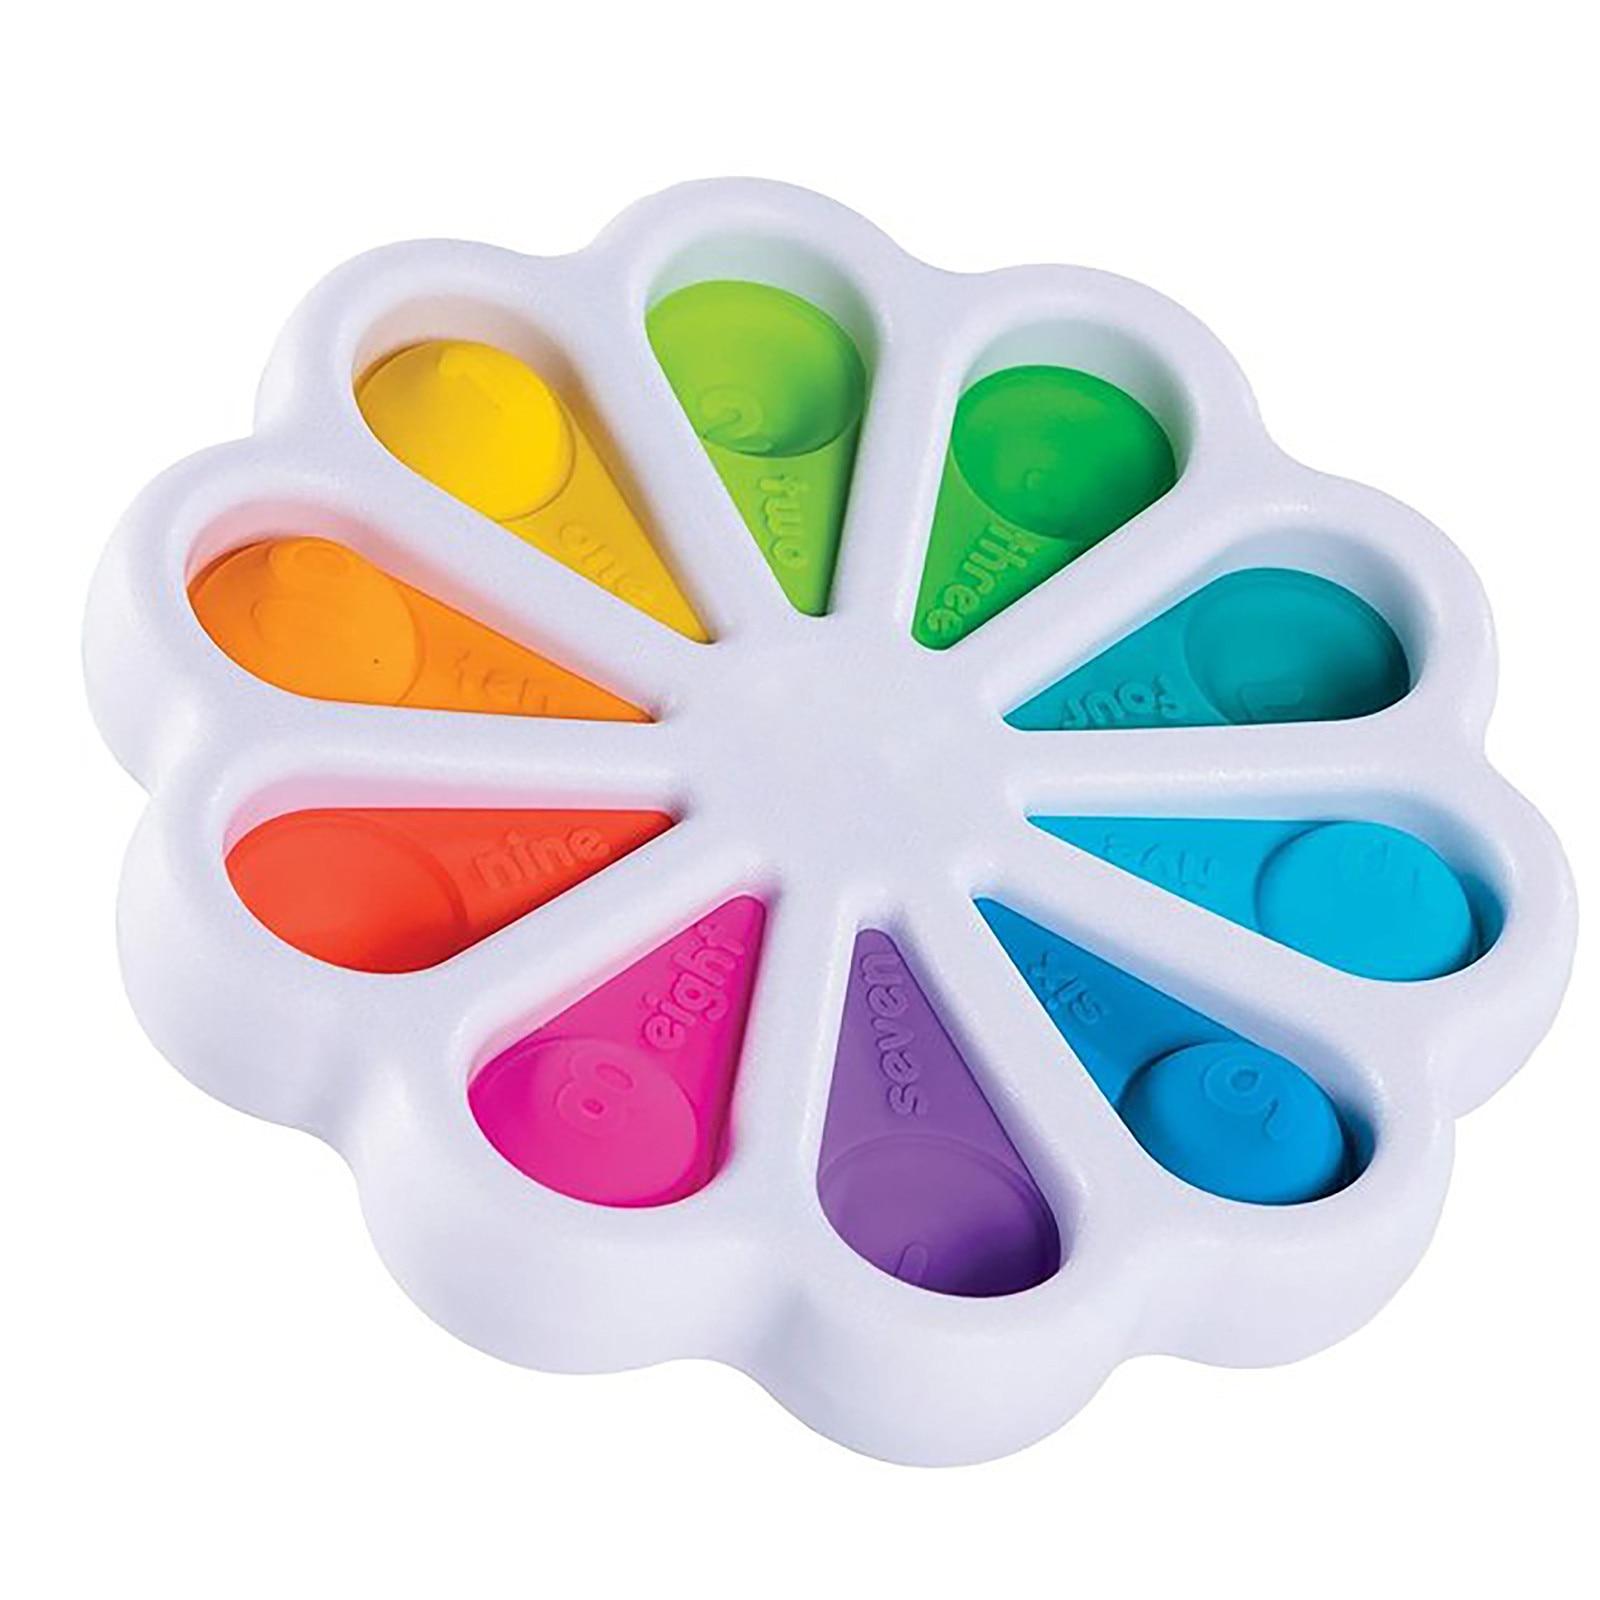 29/25Pcs Fidget Toy Set Cheap Sensory Fidget Toys Pack for Kids or Adults Decompression img4